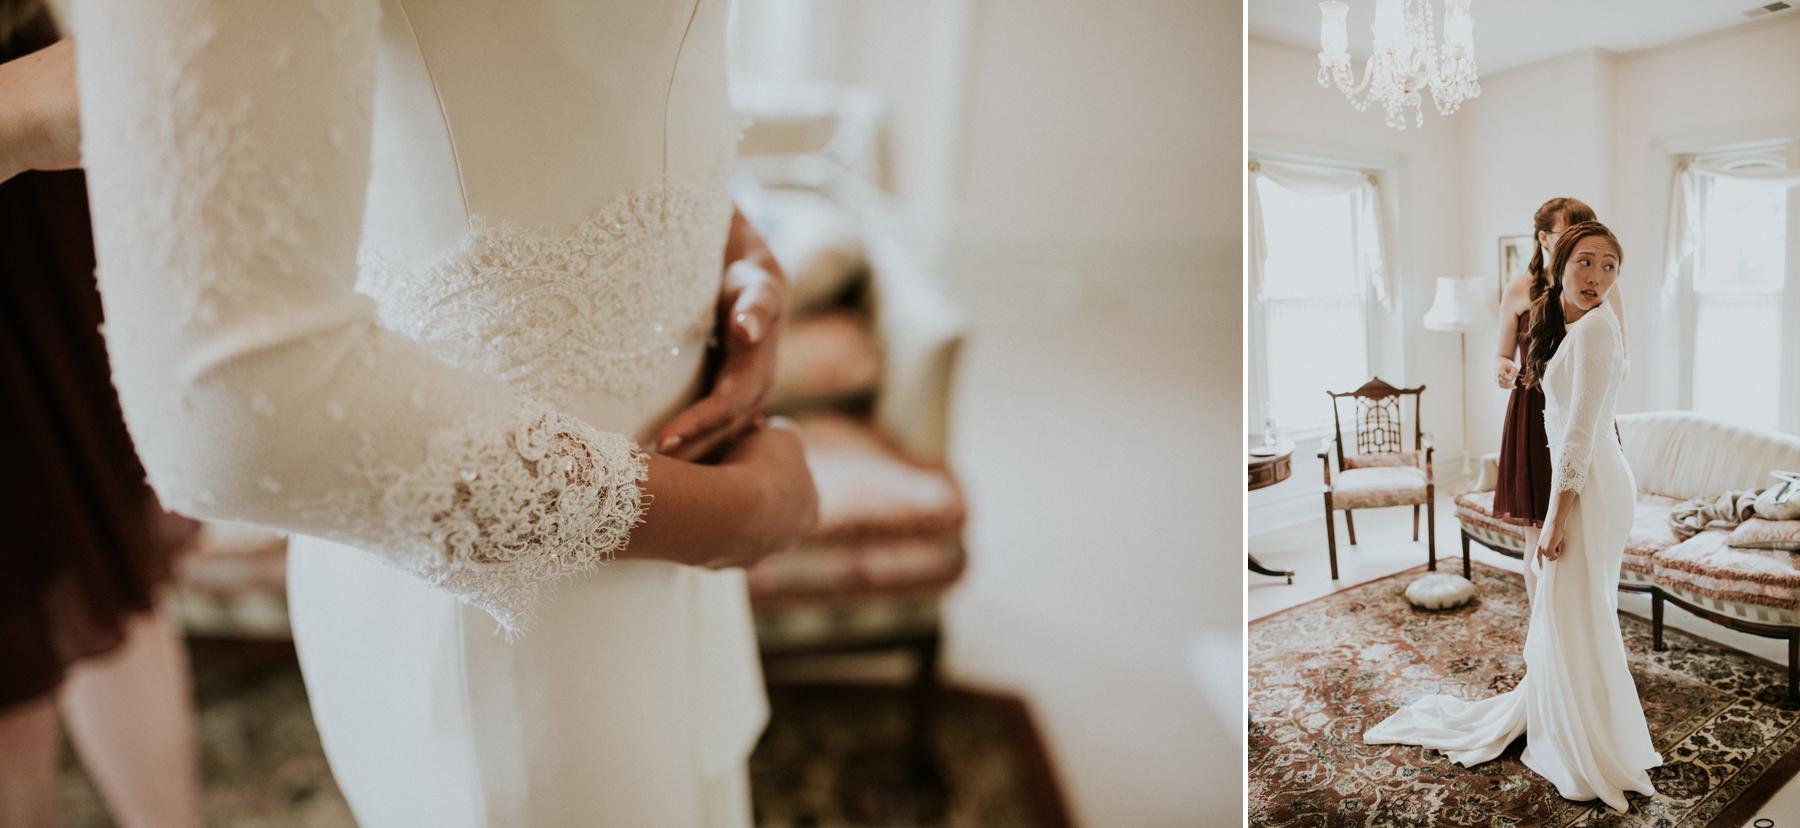 washington_dc_ceresville_mansion_wedding_photography 7.jpg